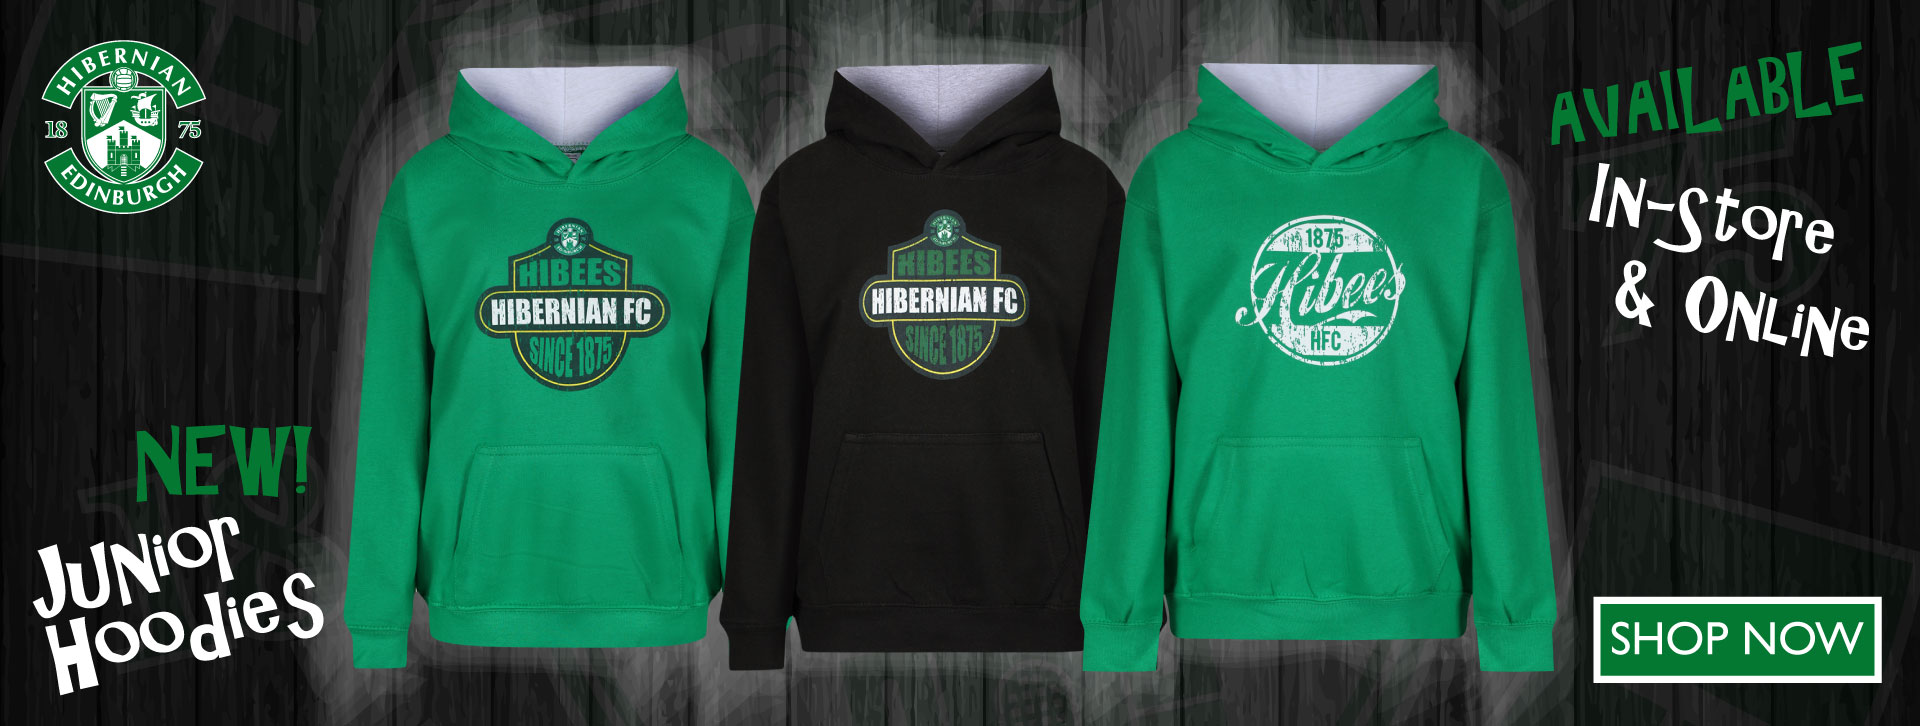 Hibernian FC Goalkeeper Kit | ON SALE NOW